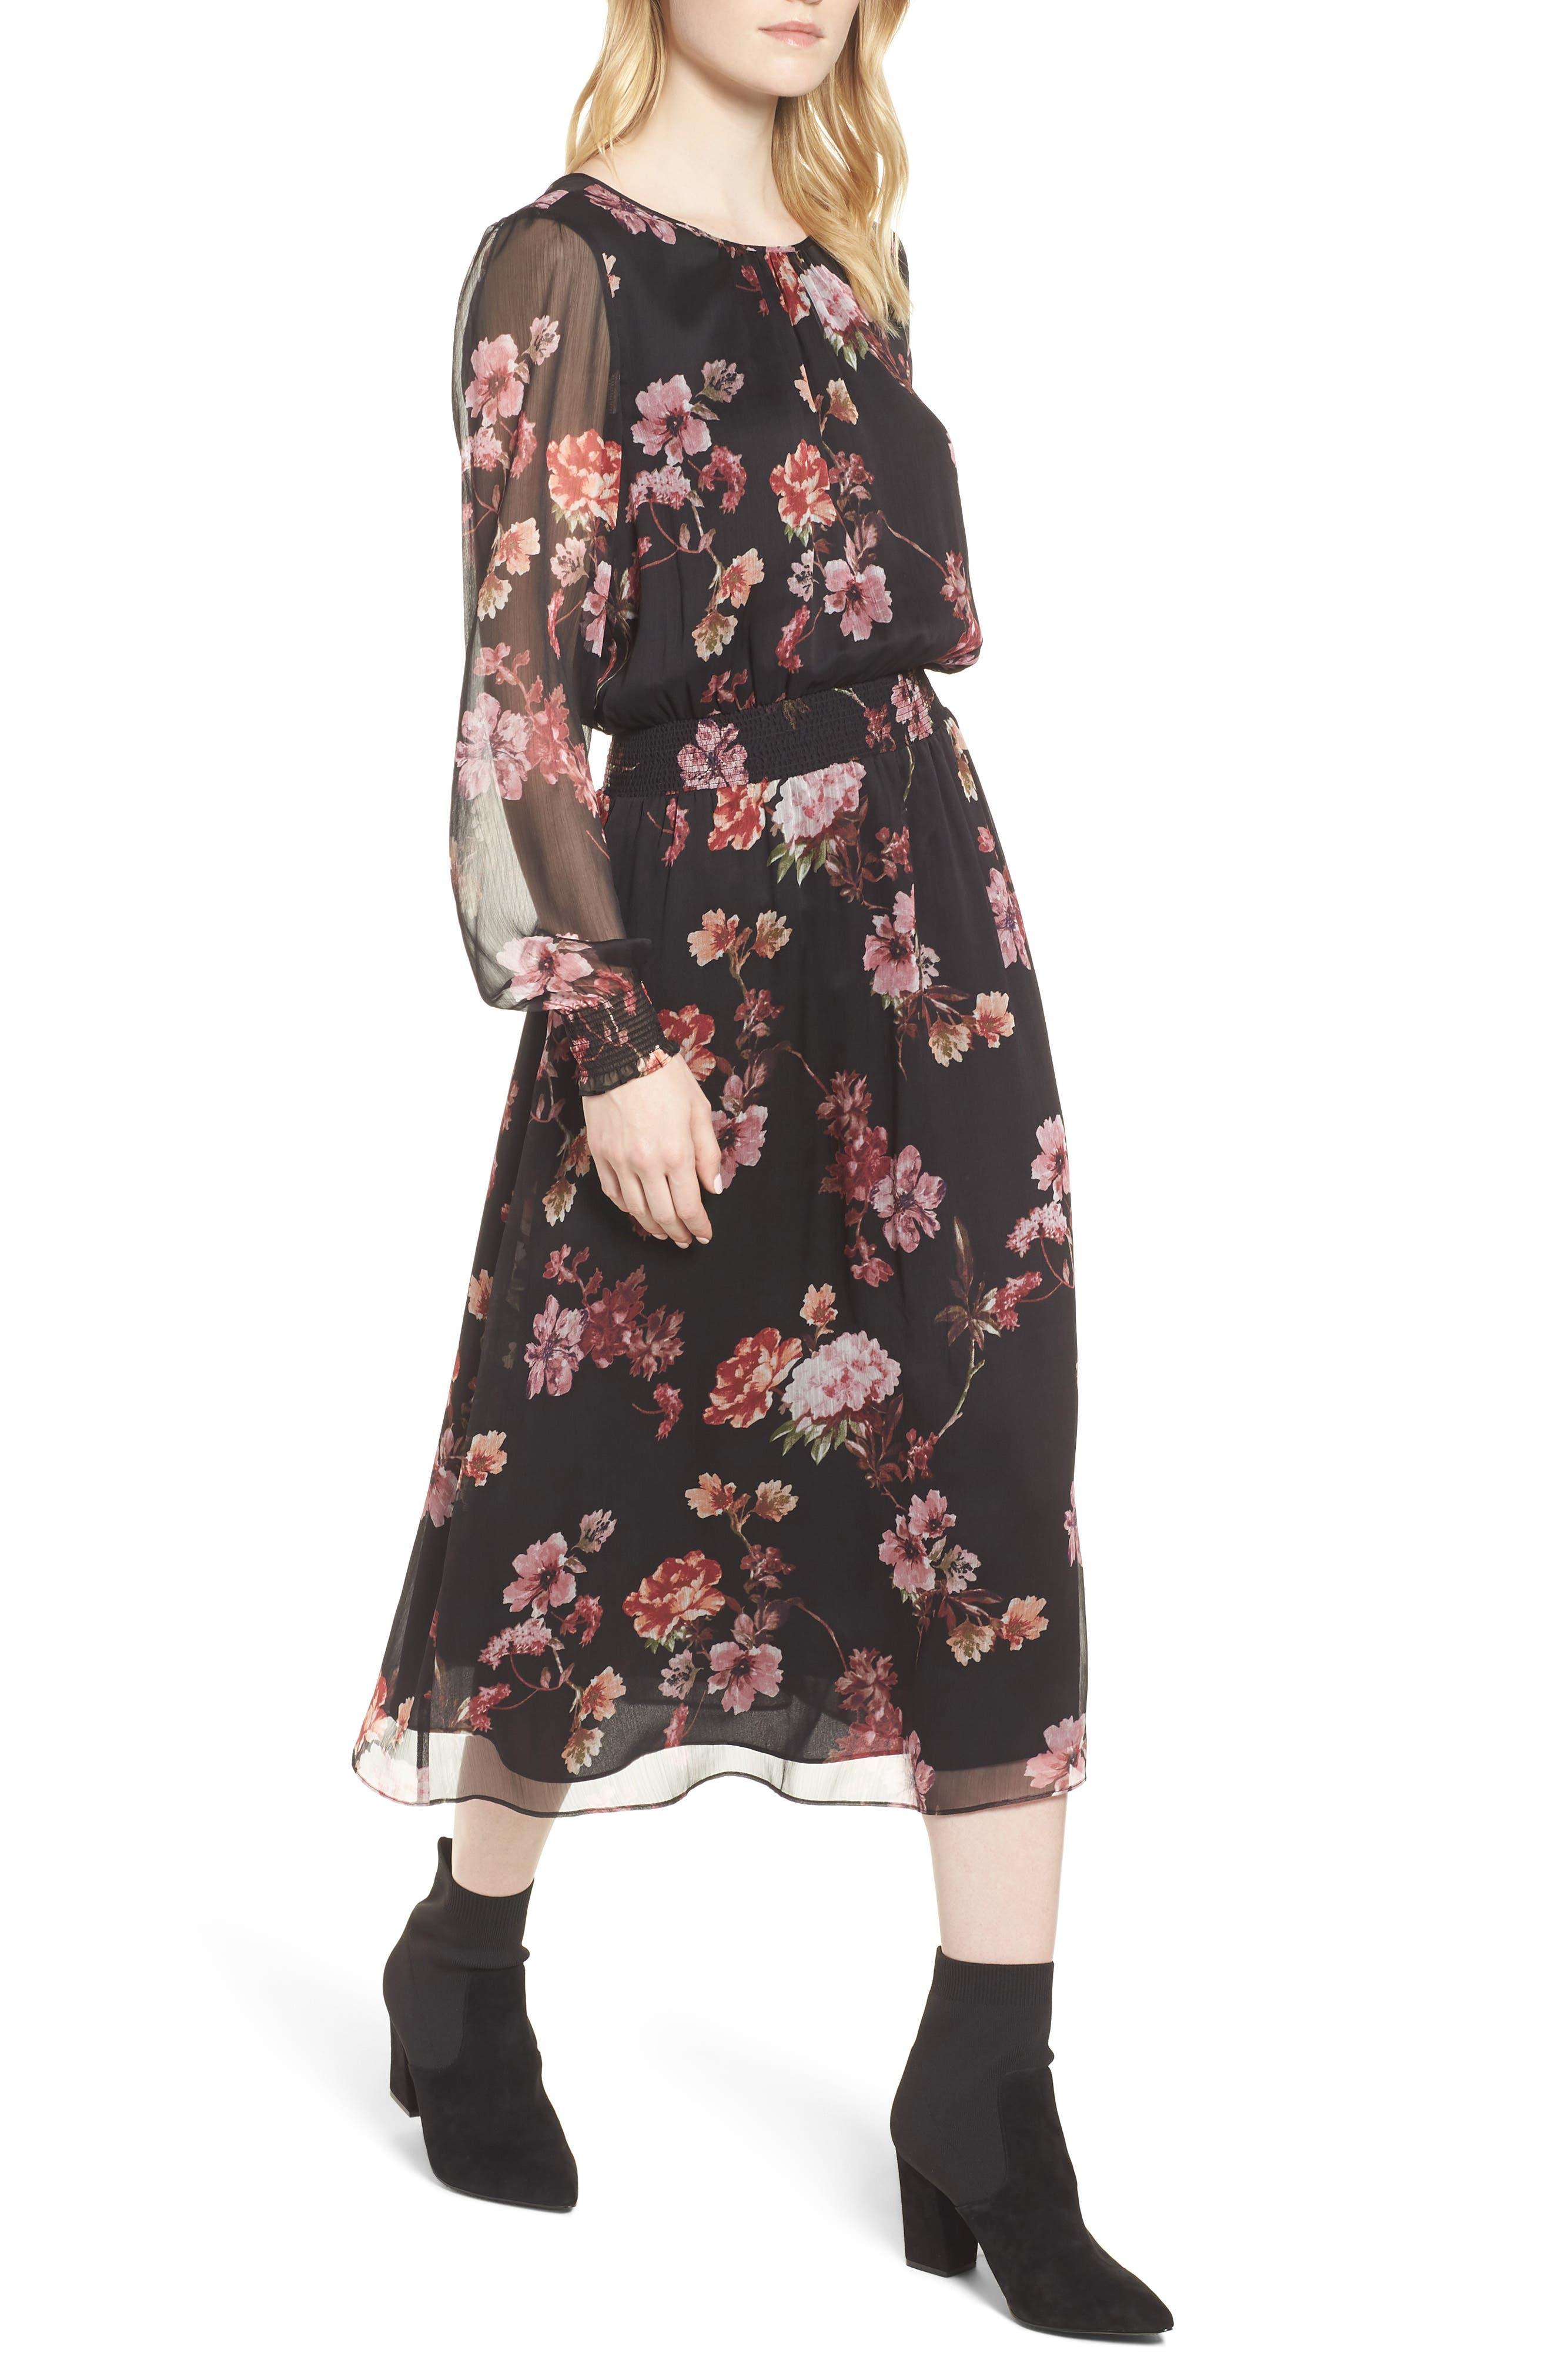 Garden Fleur Chiffon Blouson Dress,                             Main thumbnail 1, color,                             010